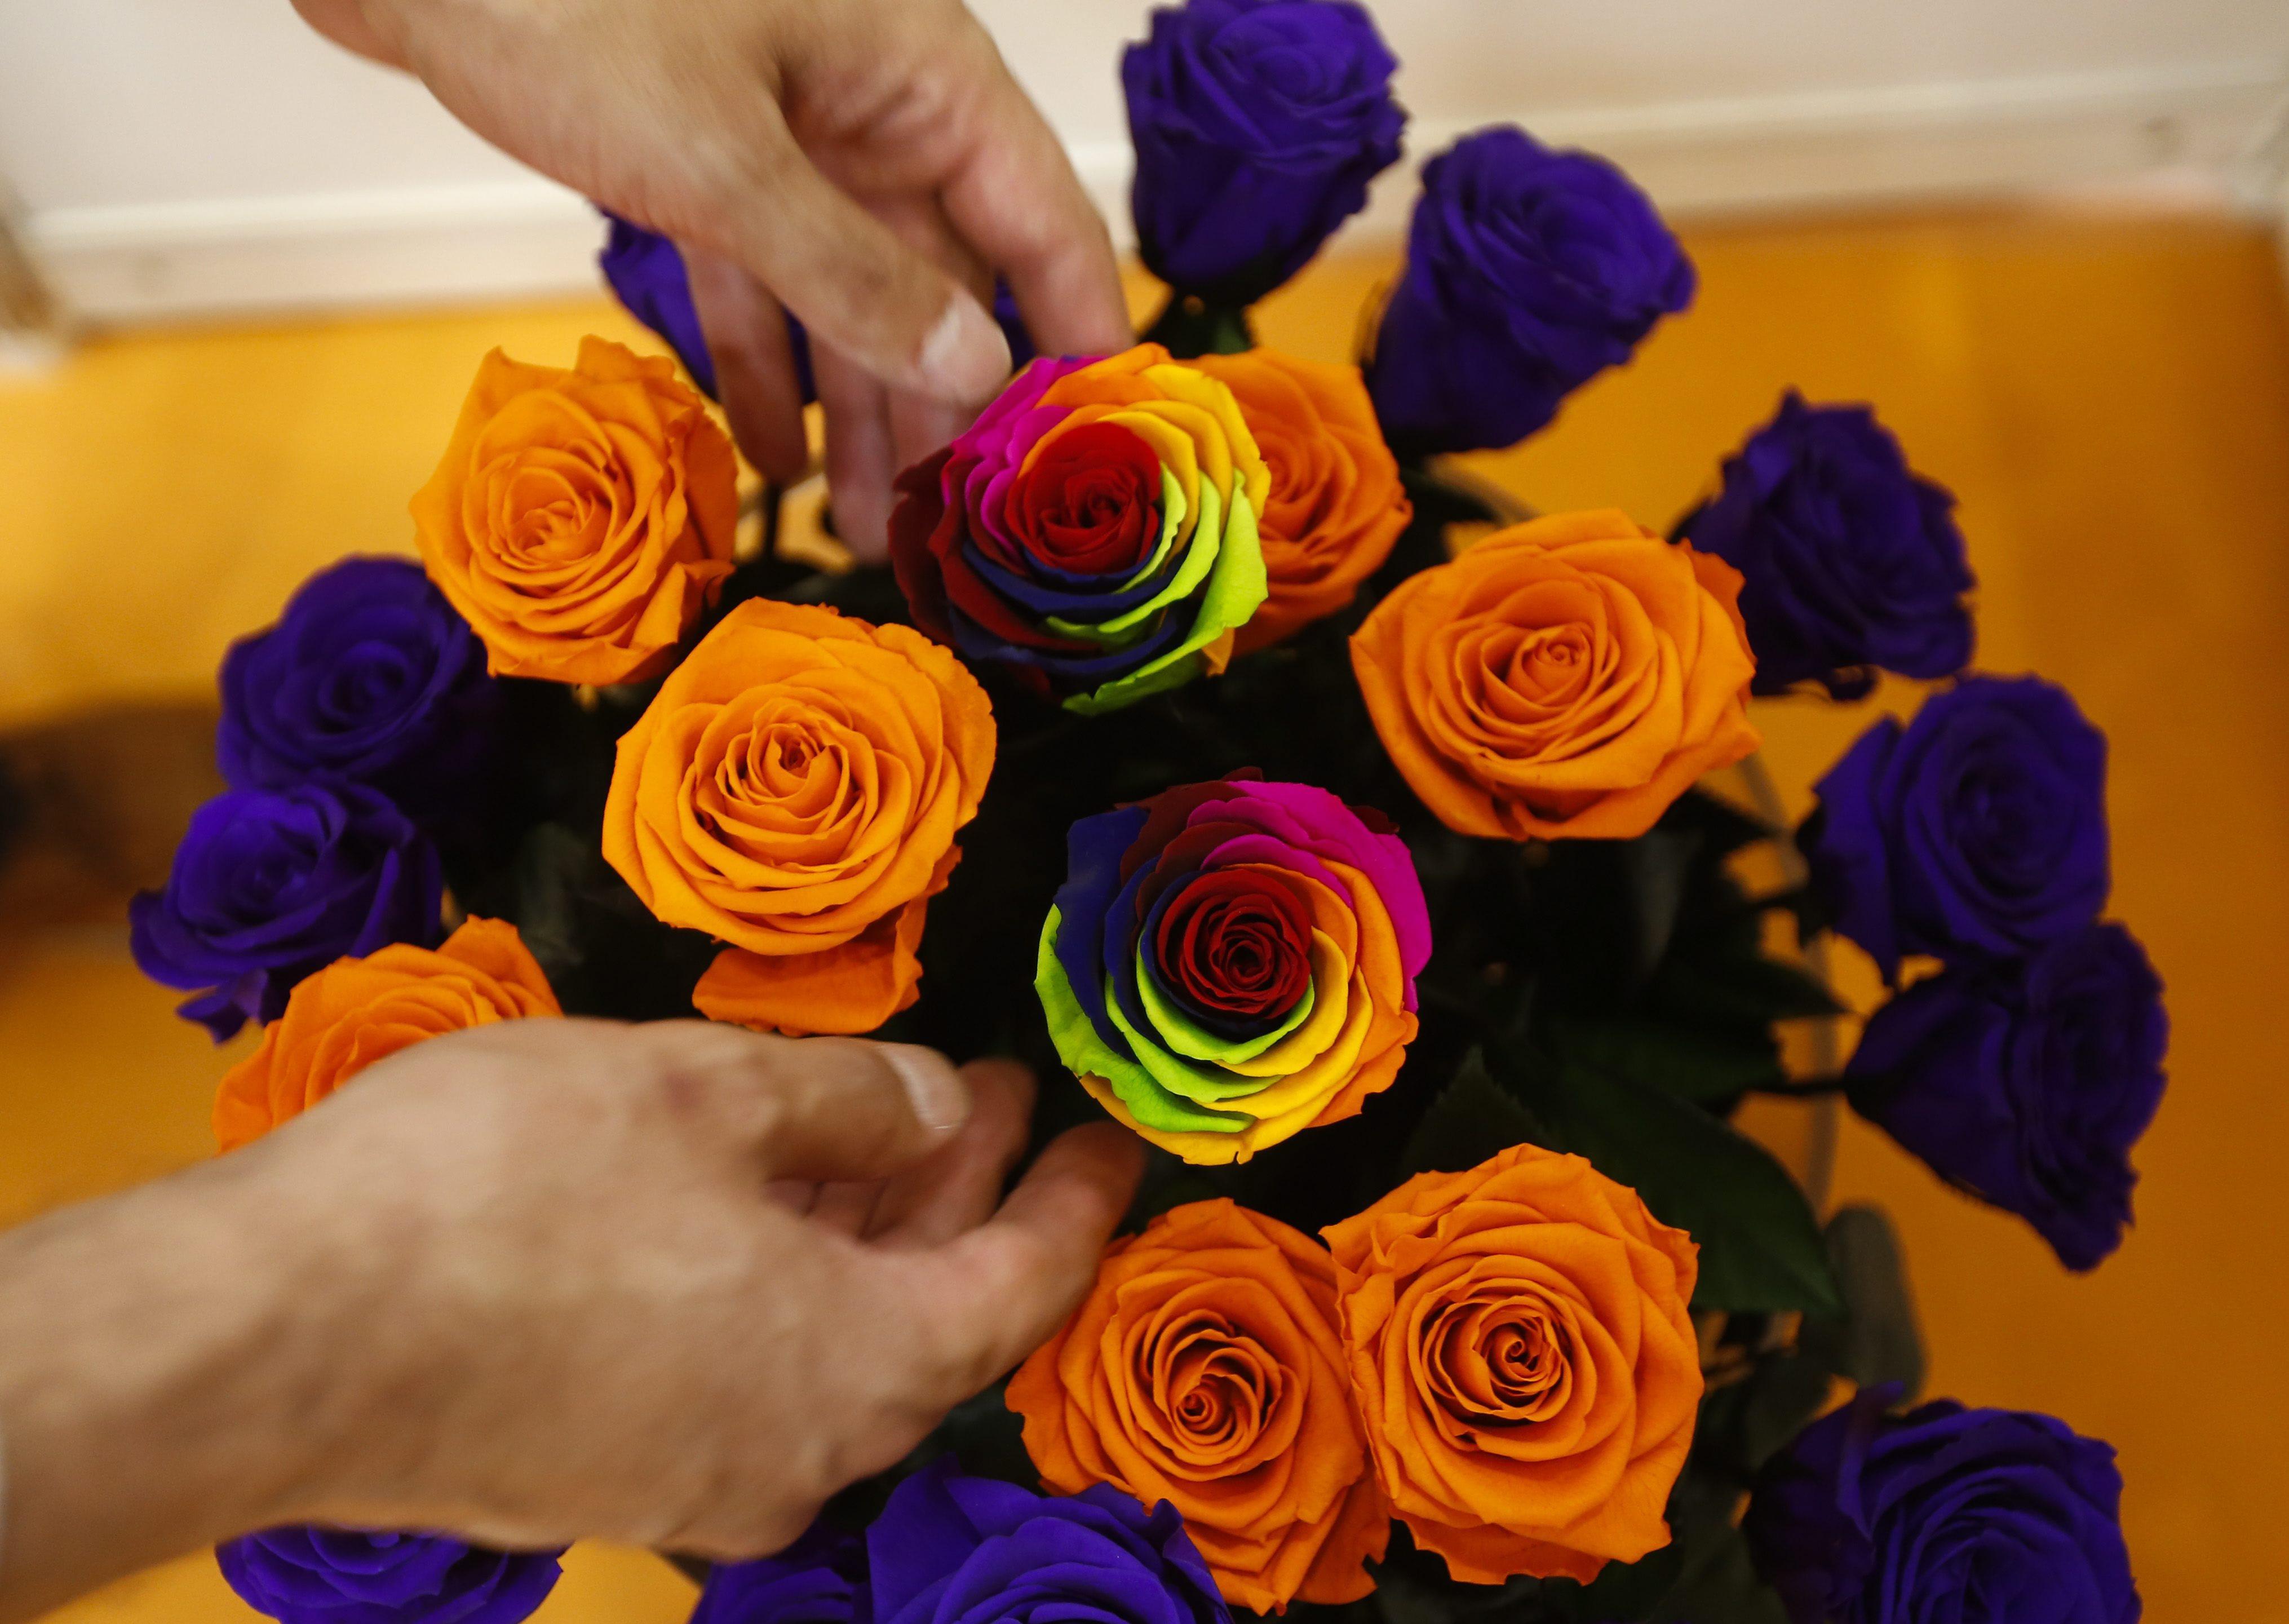 Make Your Cut Flowers Last Longer The Boston Globe